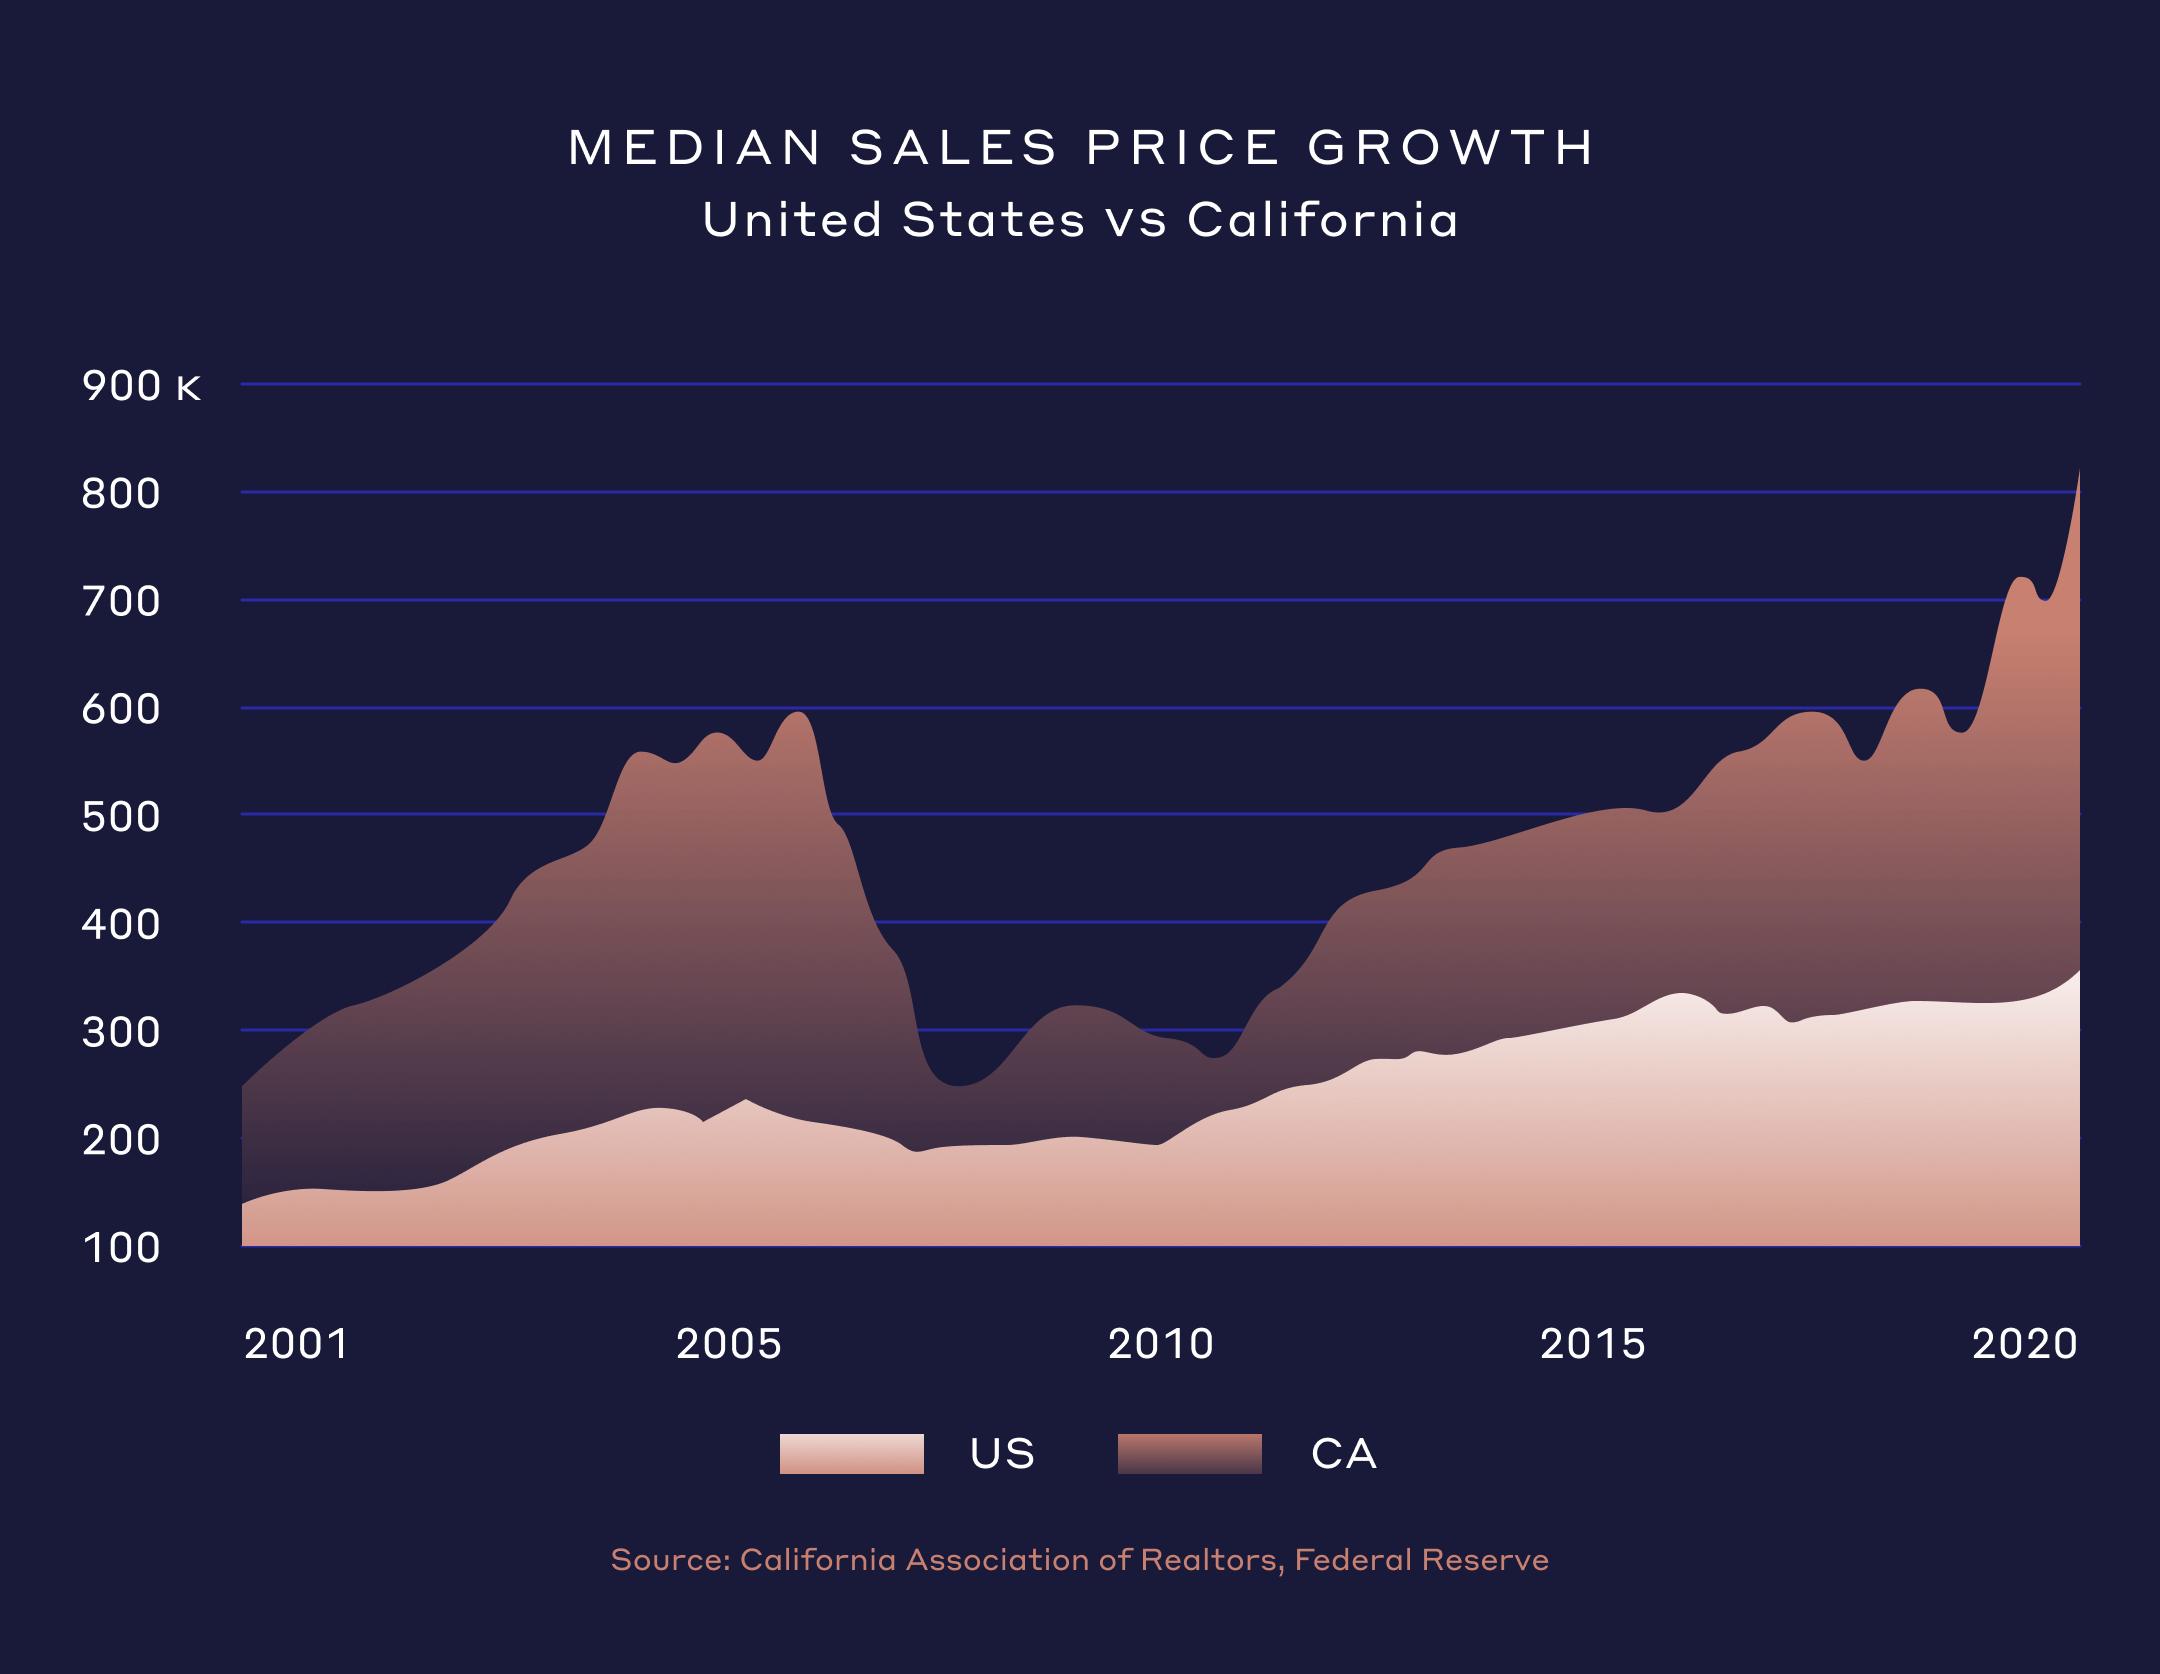 Median Sales Price Growth